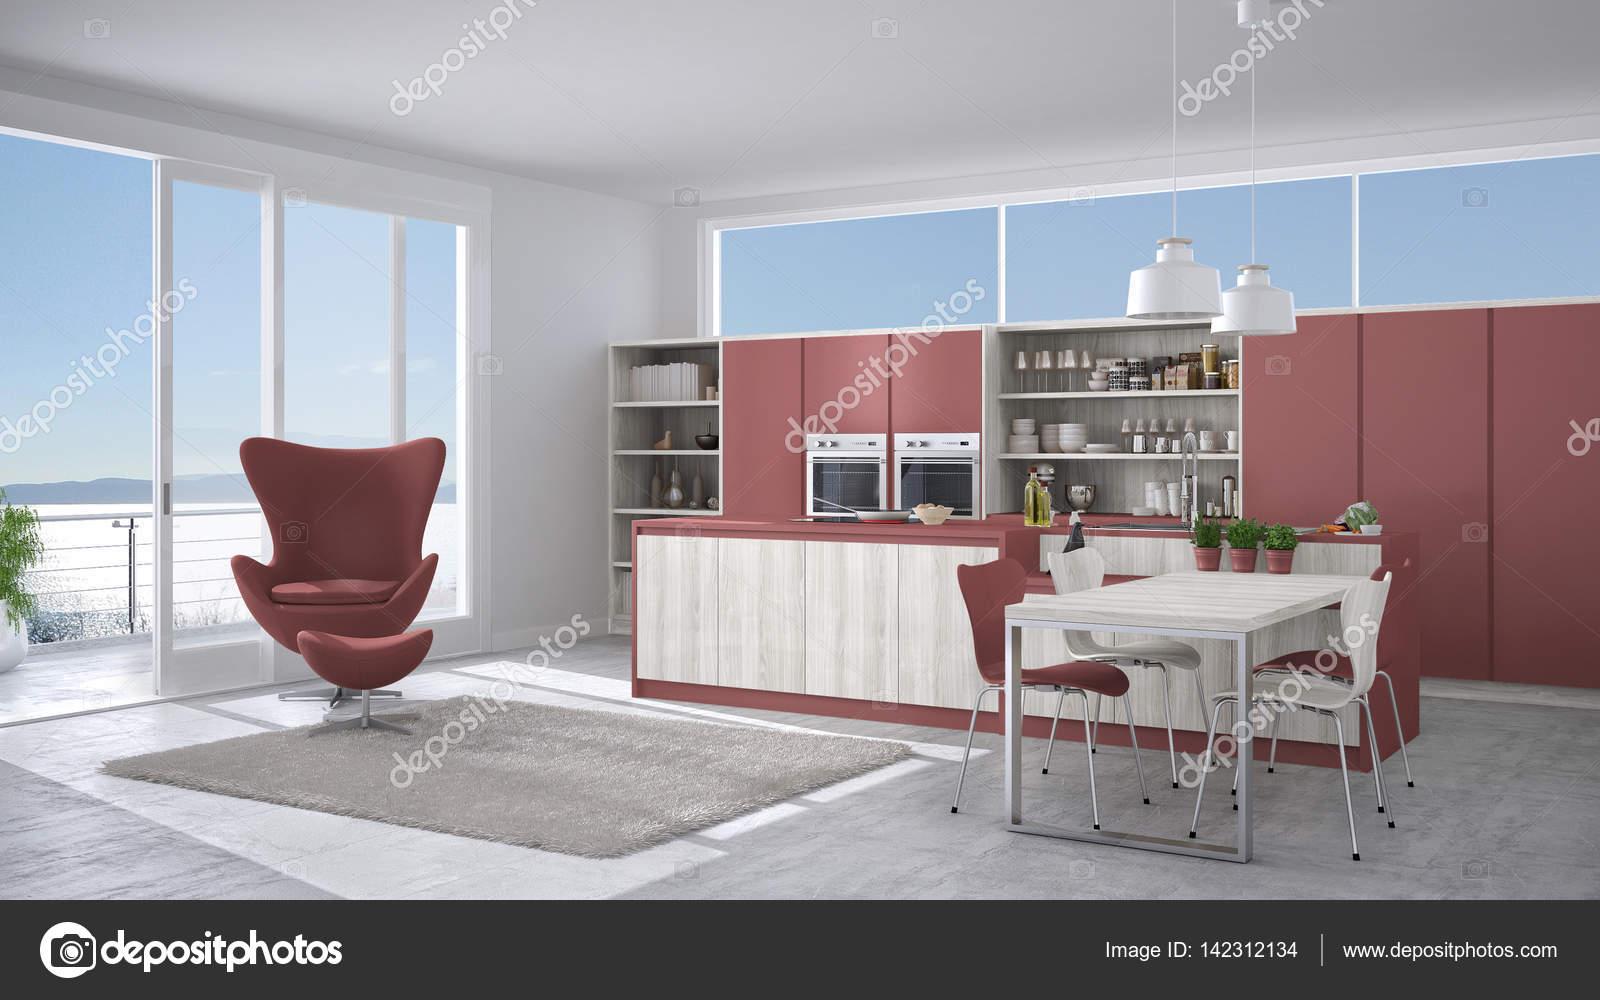 https://st3.depositphotos.com/1152281/14231/i/1600/depositphotos_142312134-stock-photo-modern-white-and-red-kitchen.jpg